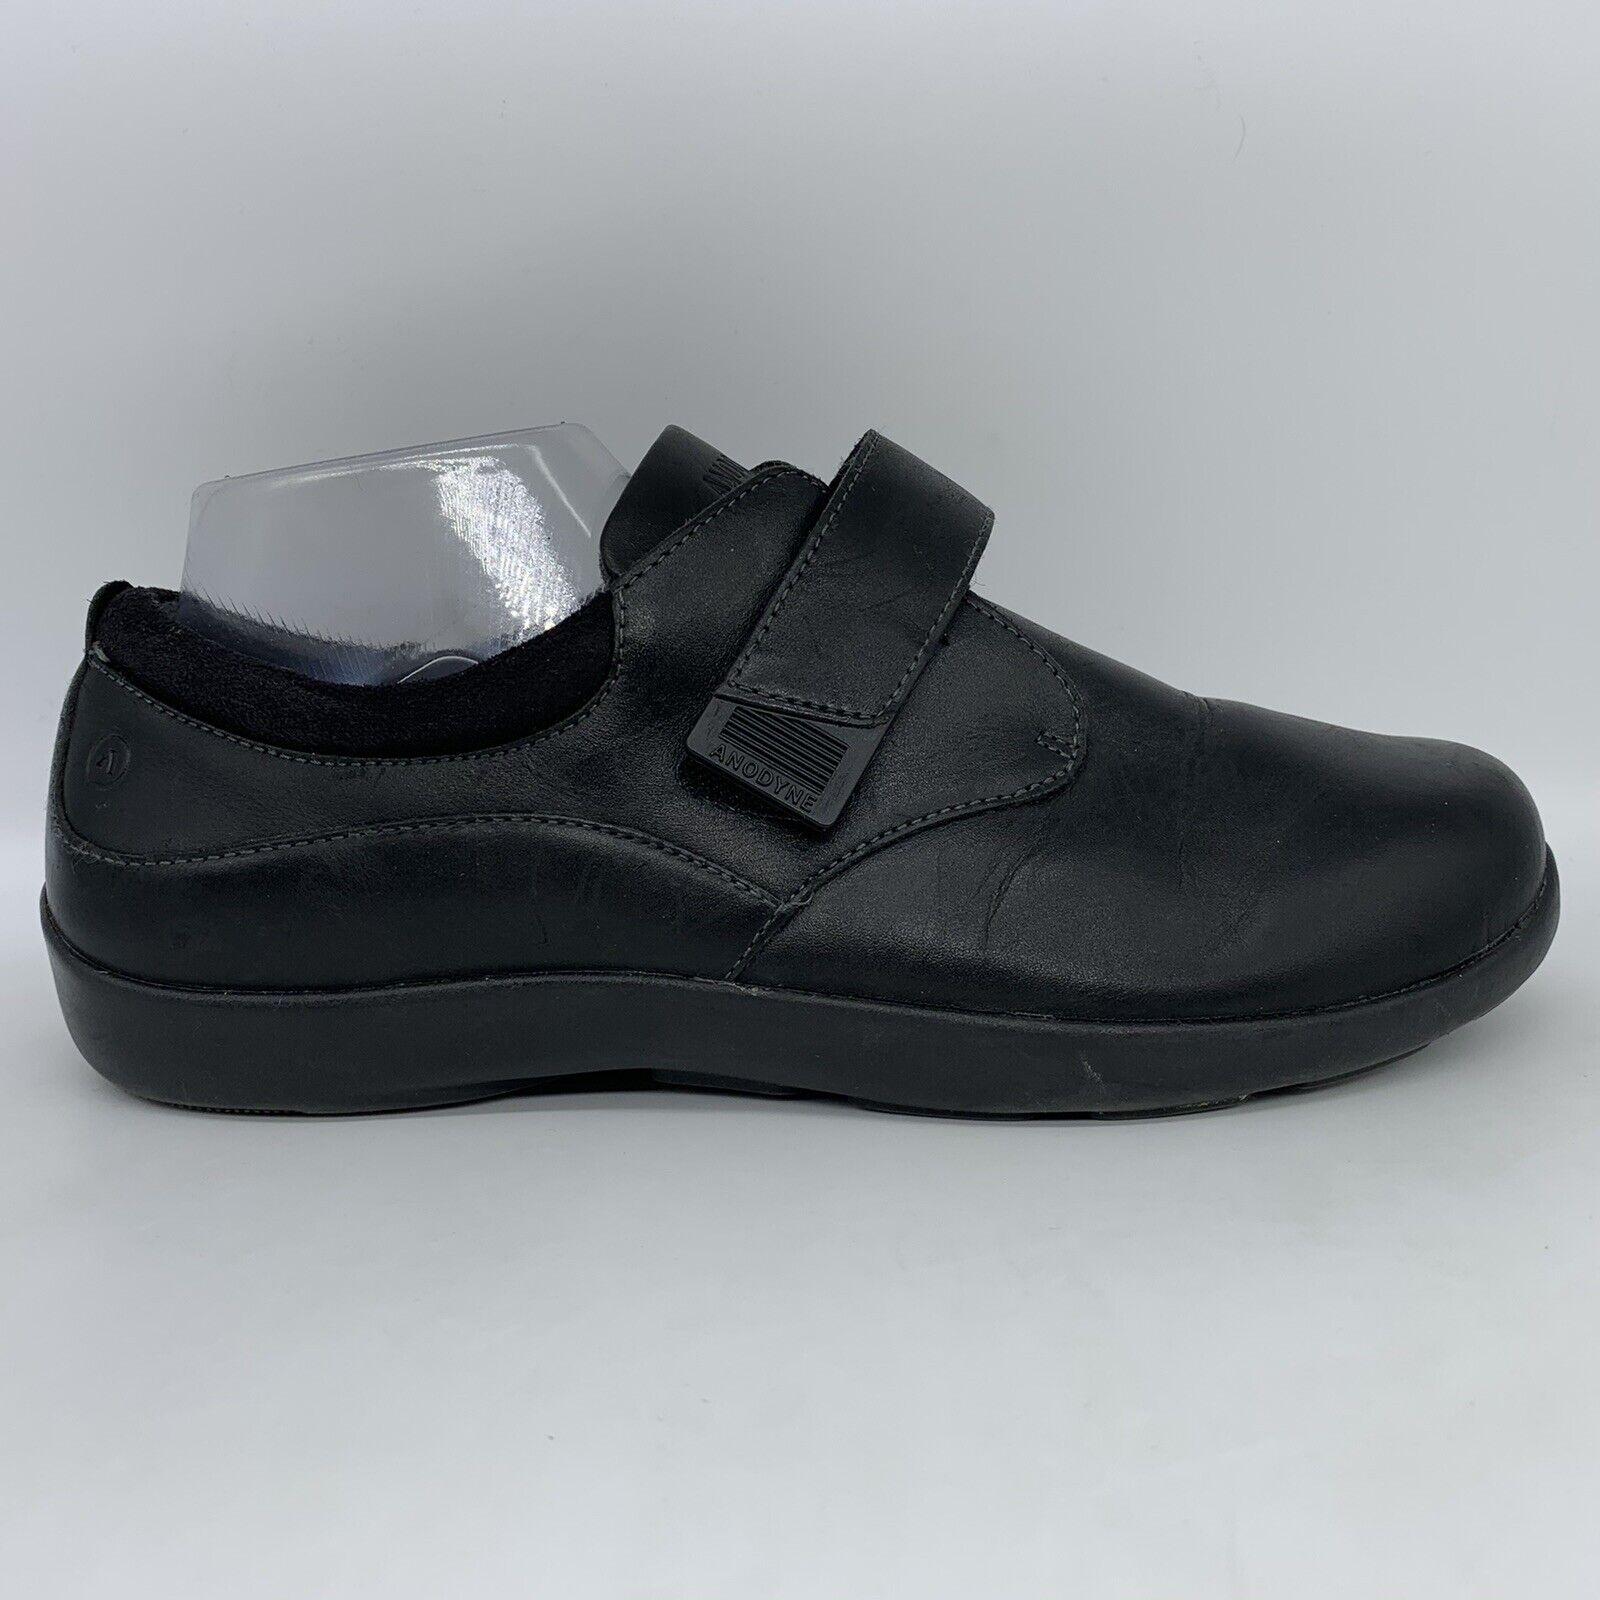 Anodyne No 67 Black Leather Diabetic Comfort Strap Shoes Women 9 W Wide